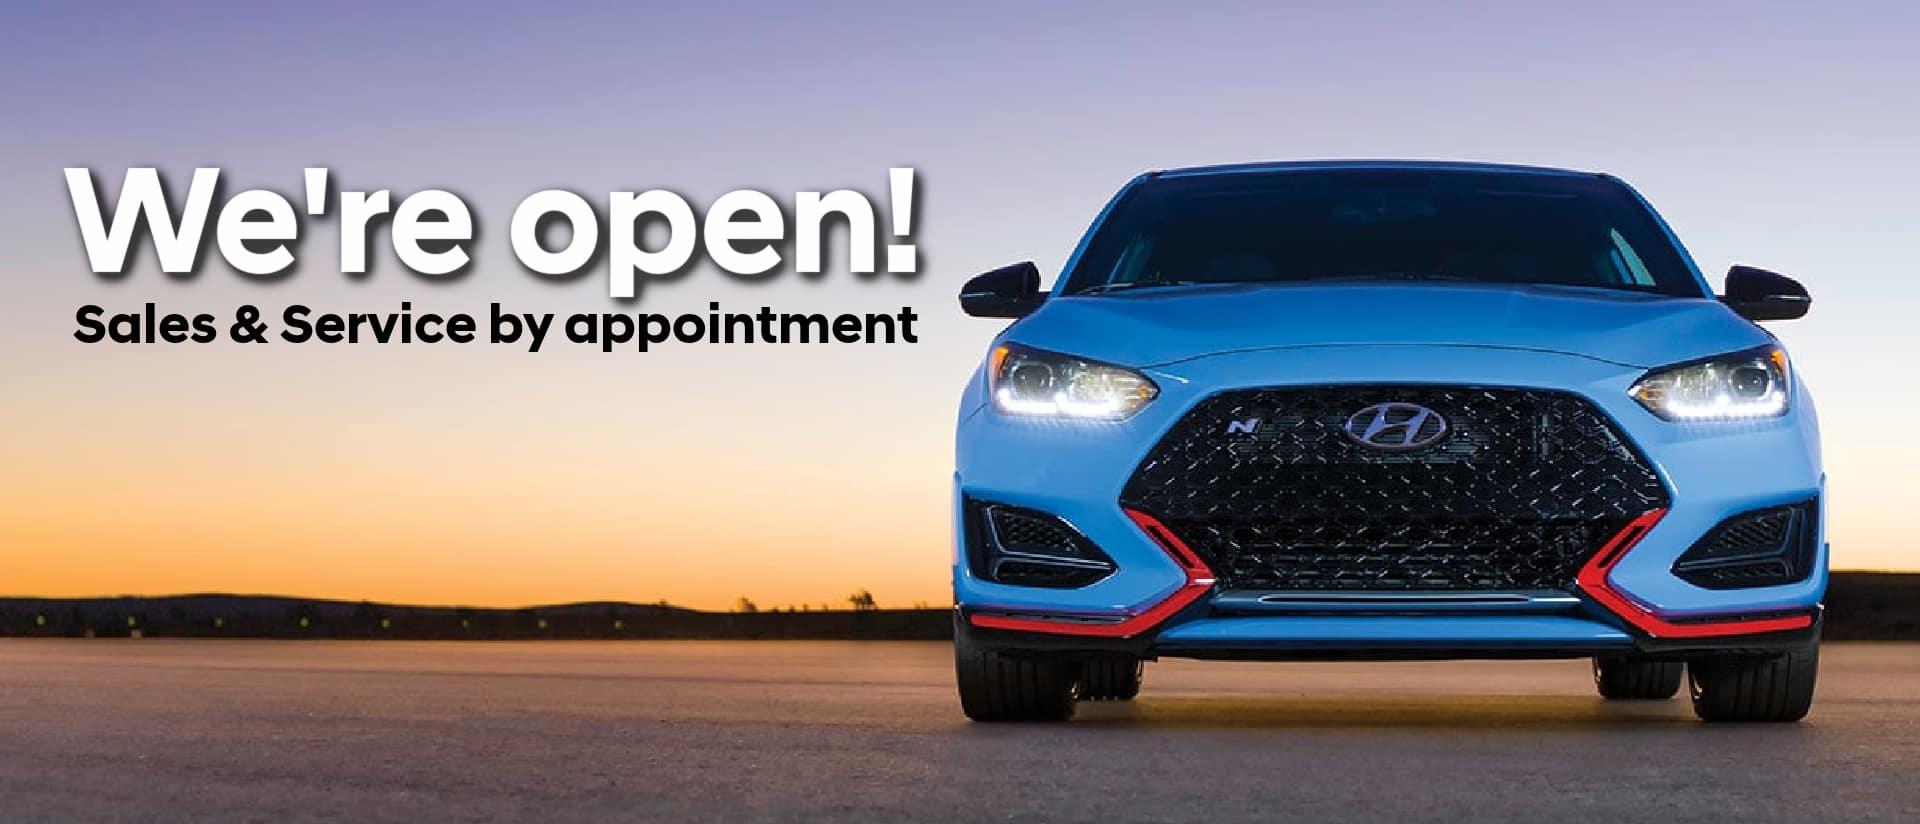 We're open Hyundai2